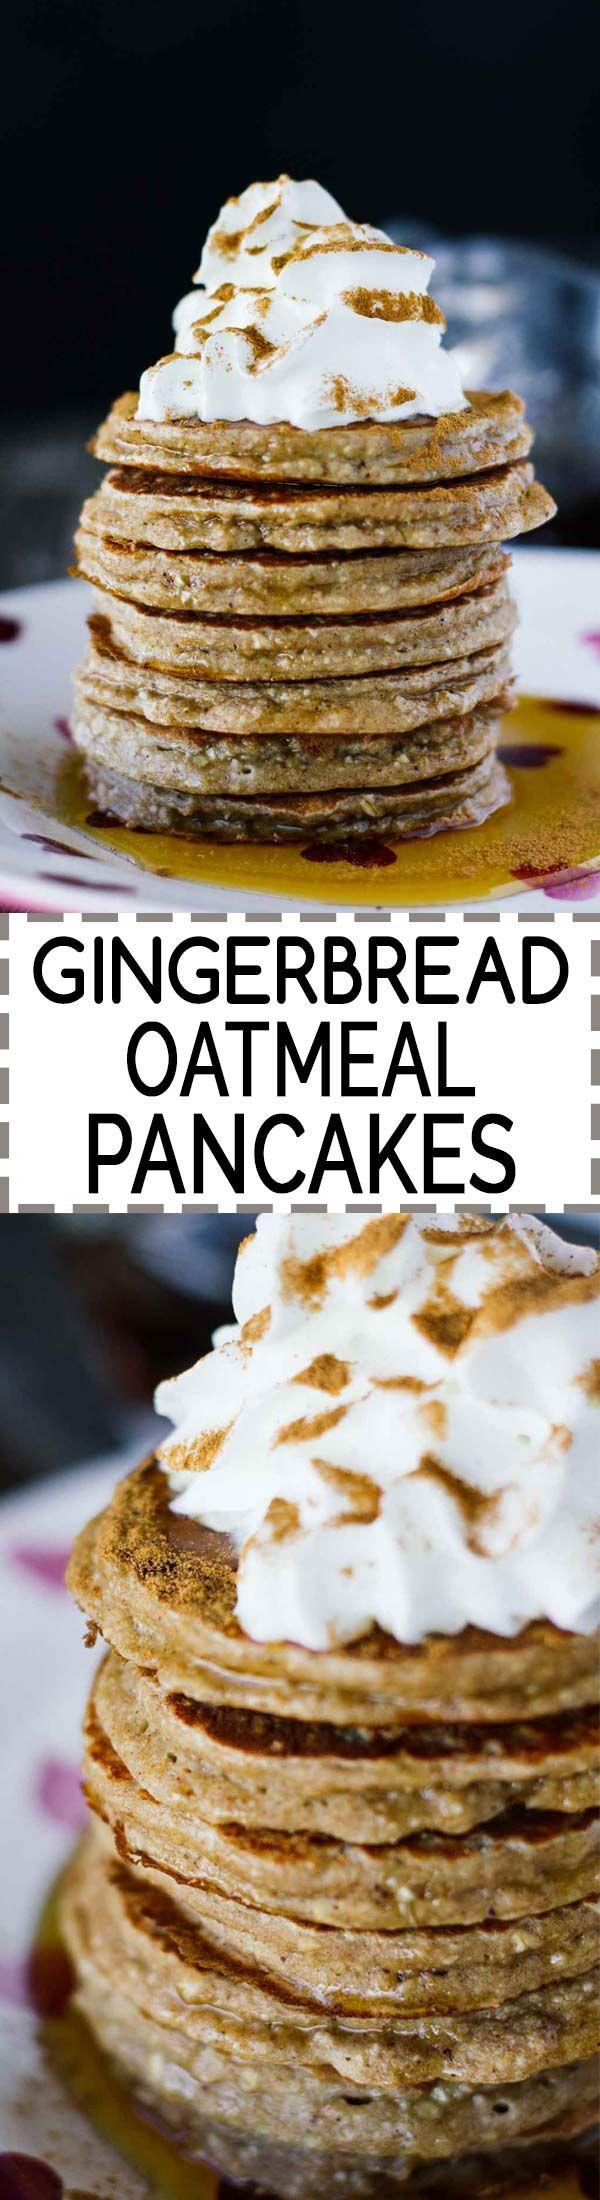 Gingerbread Oatmeal Pancakes! Healthy, gluten-free, vegetarian ...